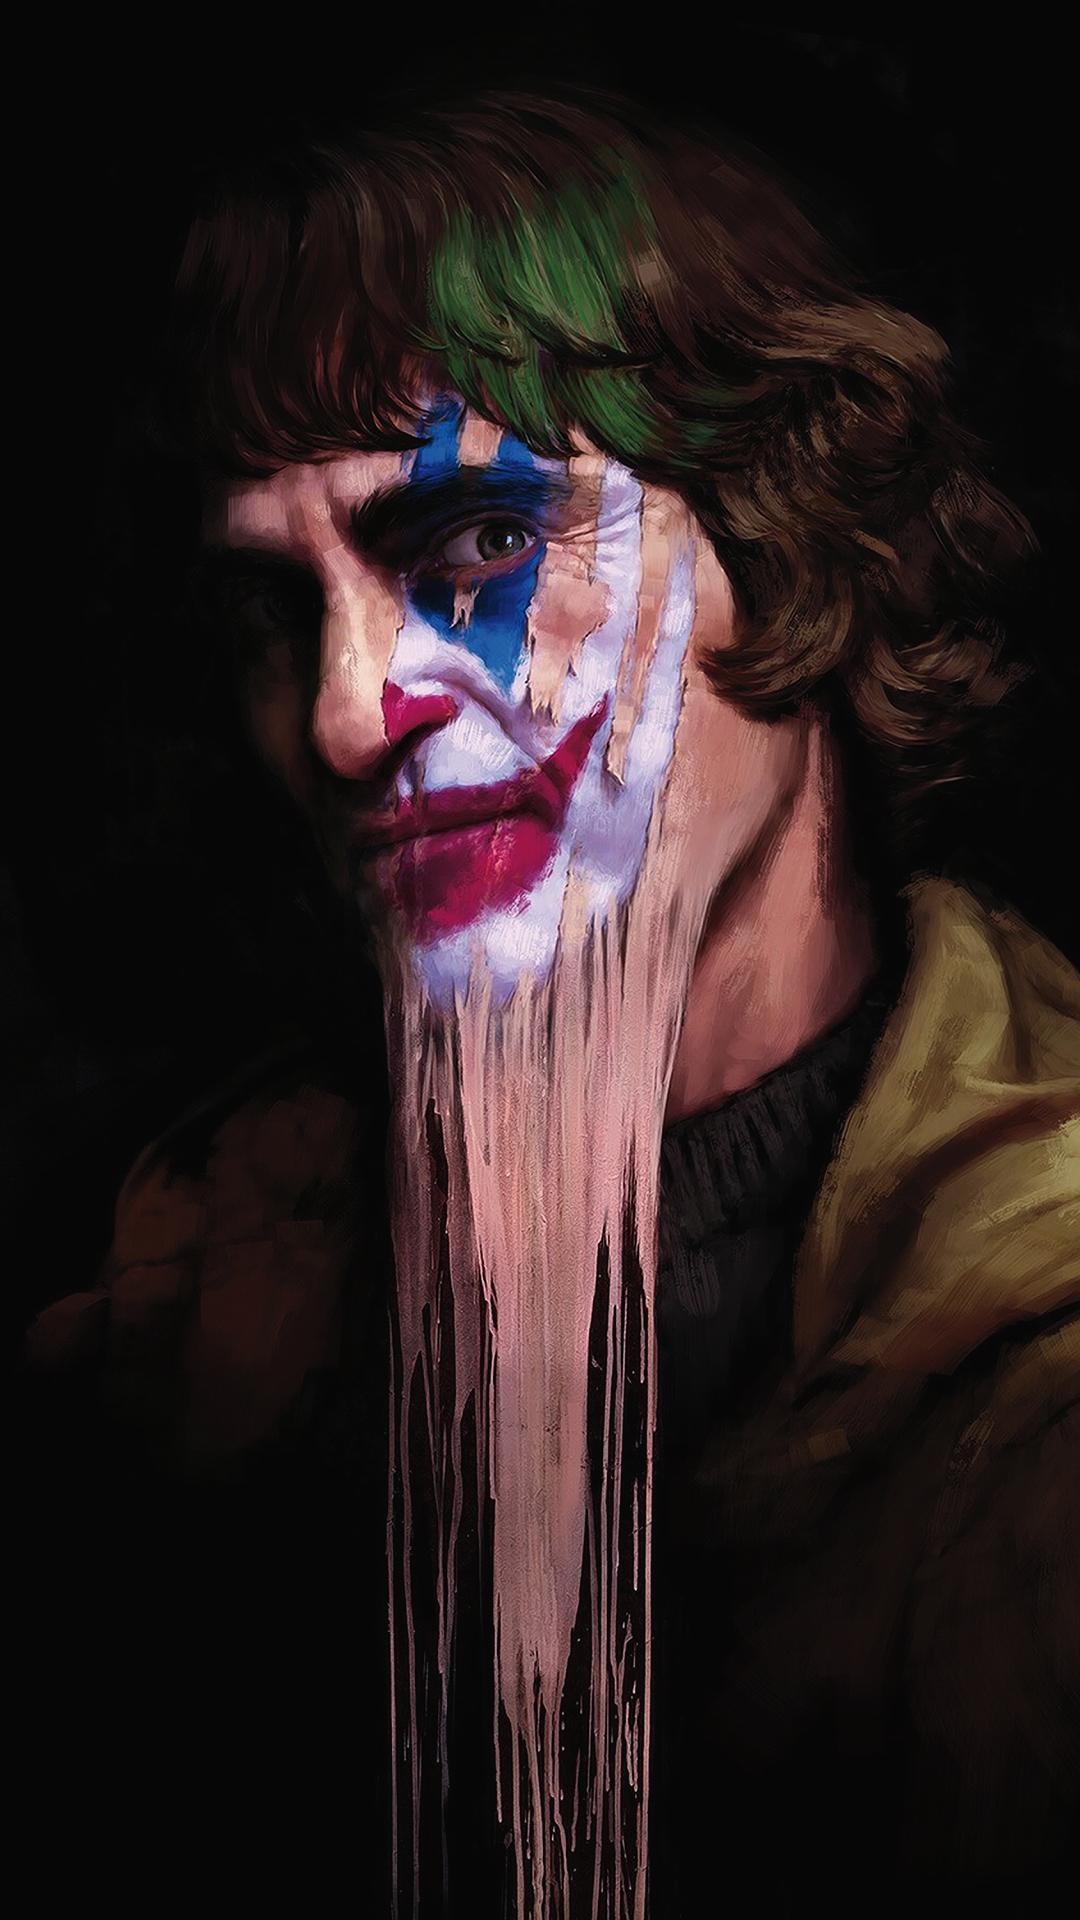 1080x1920 Joker Joaquin Phoenix Iphone 7 6s 6 Plus And